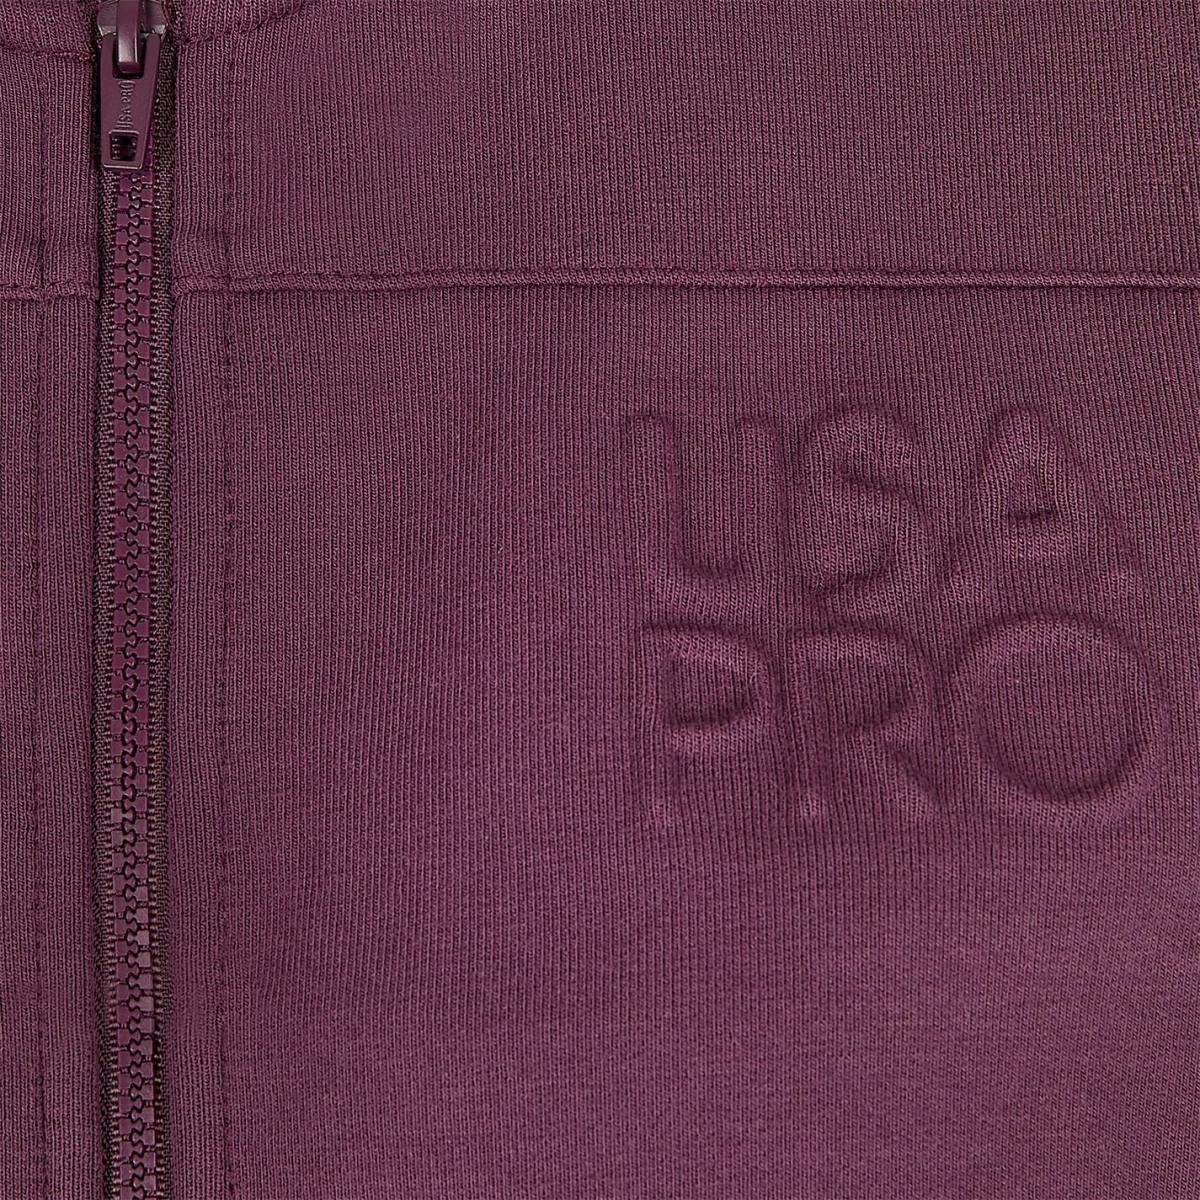 USA Pro Fleece Bomber Jacke Damen 0201